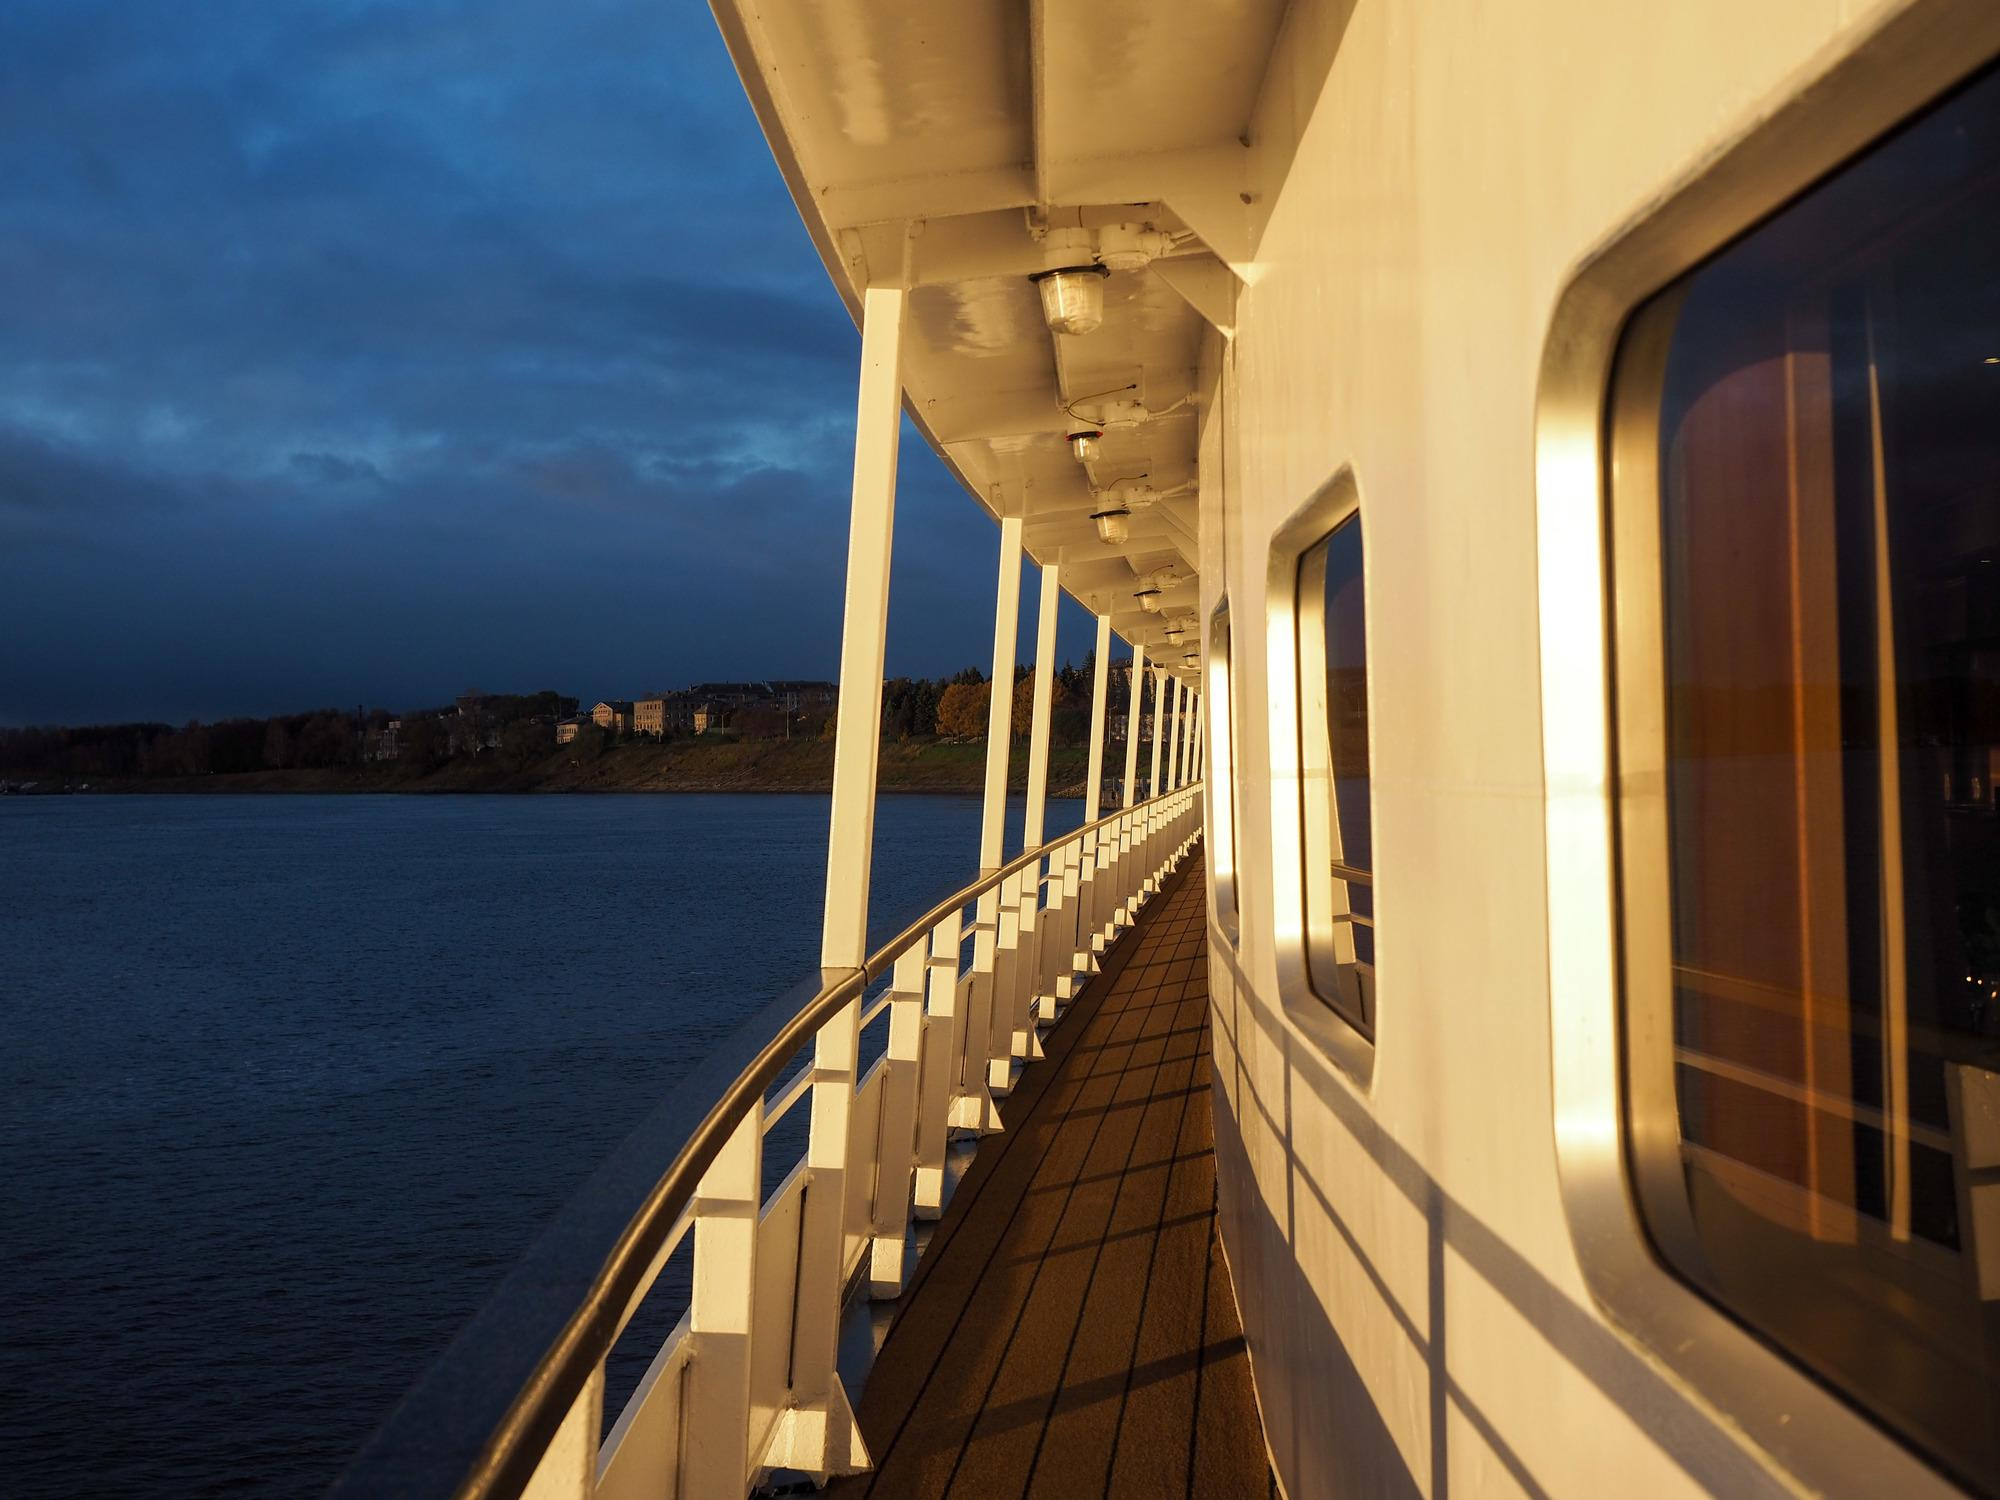 Viking Akun on the Volga River in Russia